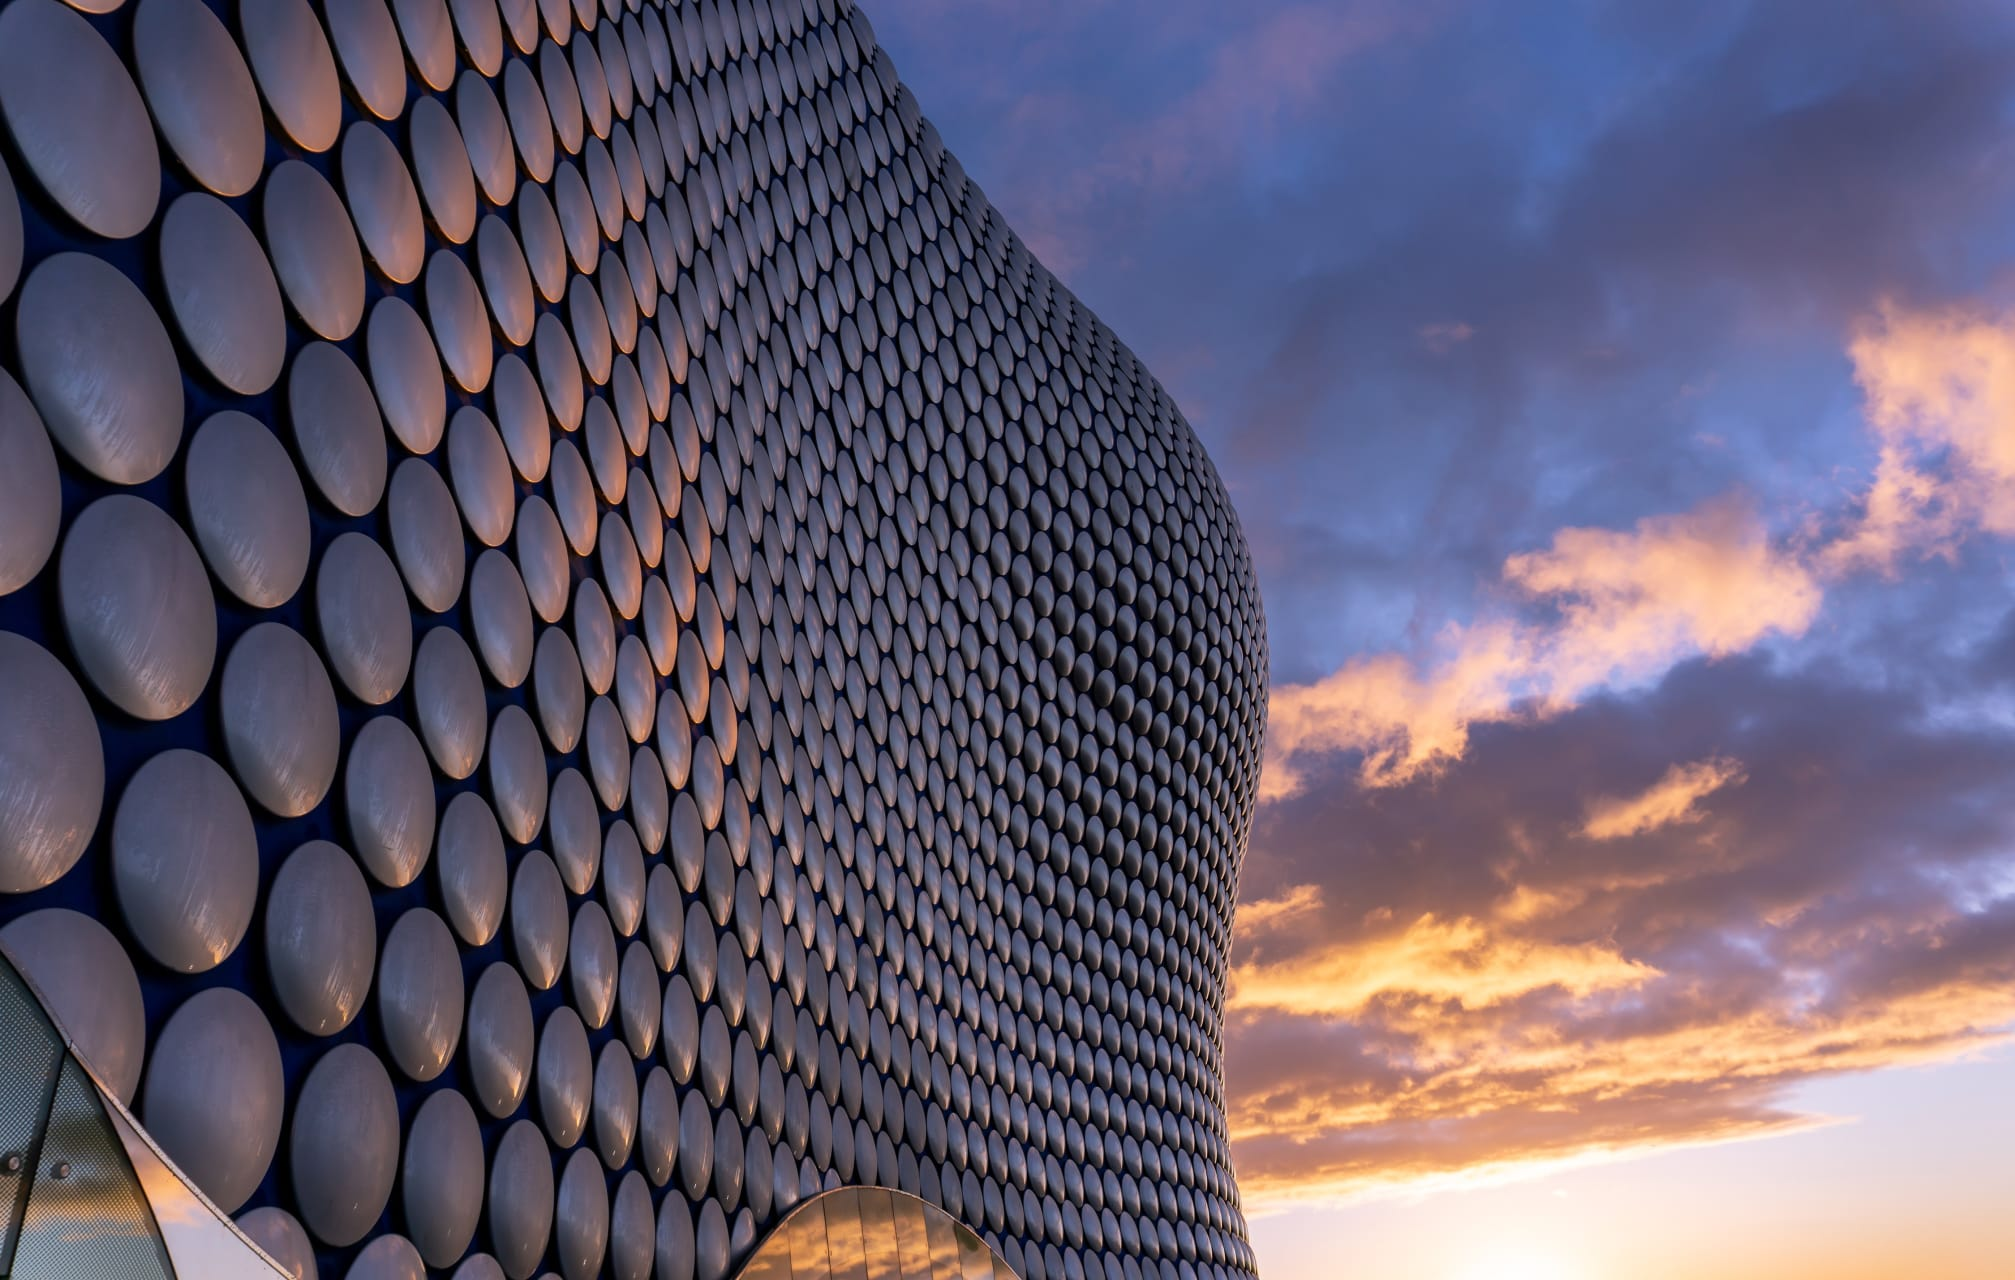 Birmingham - Bull Ring - Where It All Began